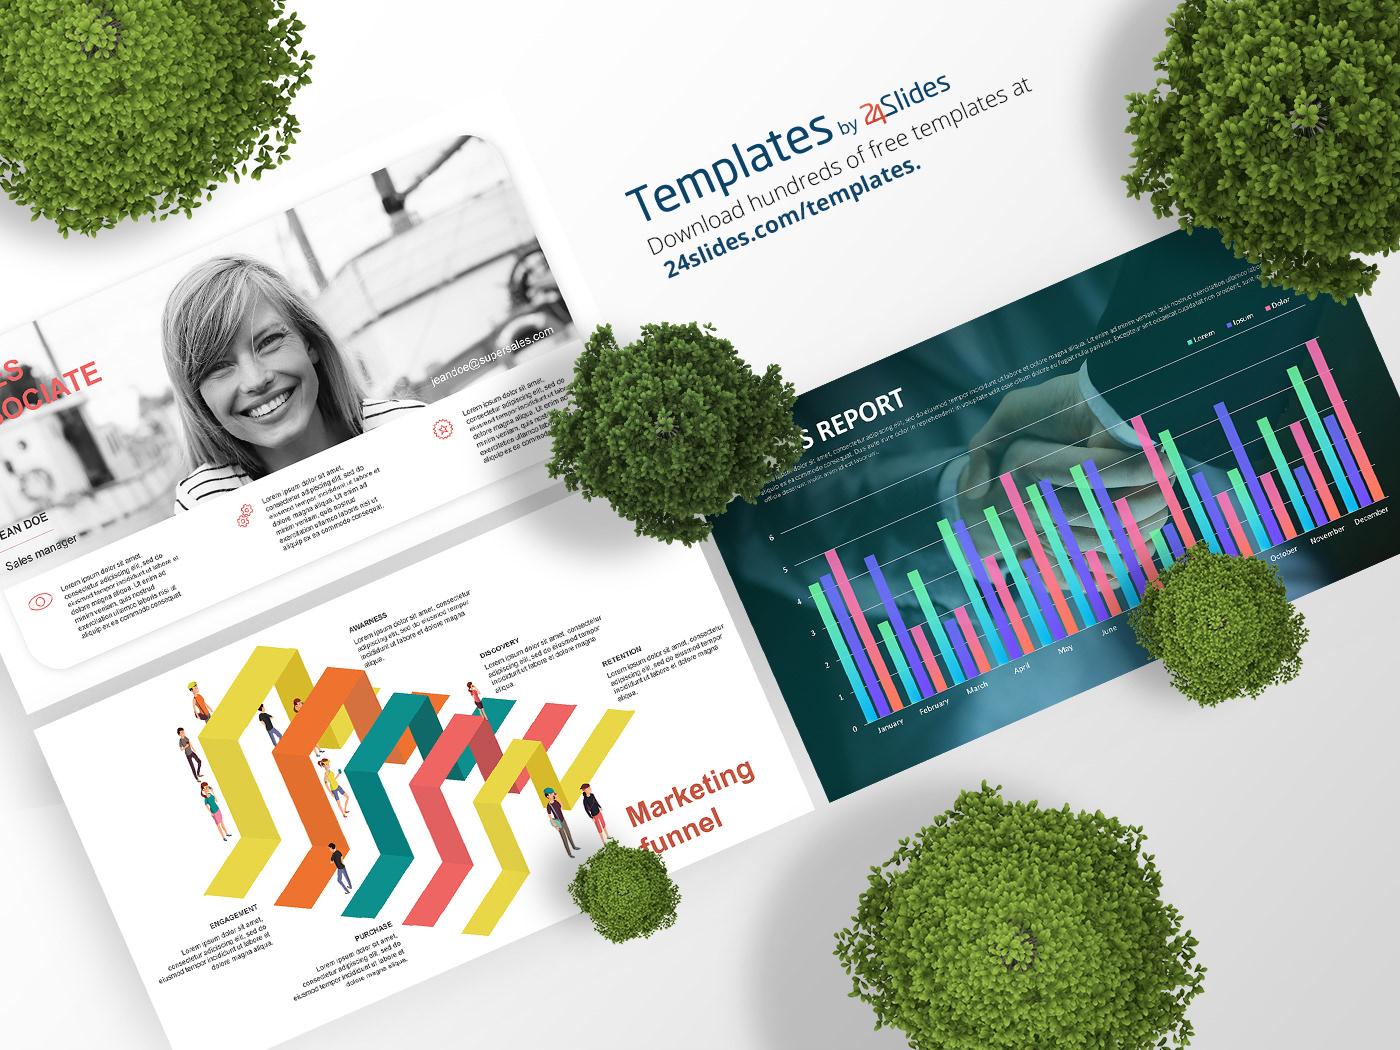 Business presentation presentation download corporate branding Free Template